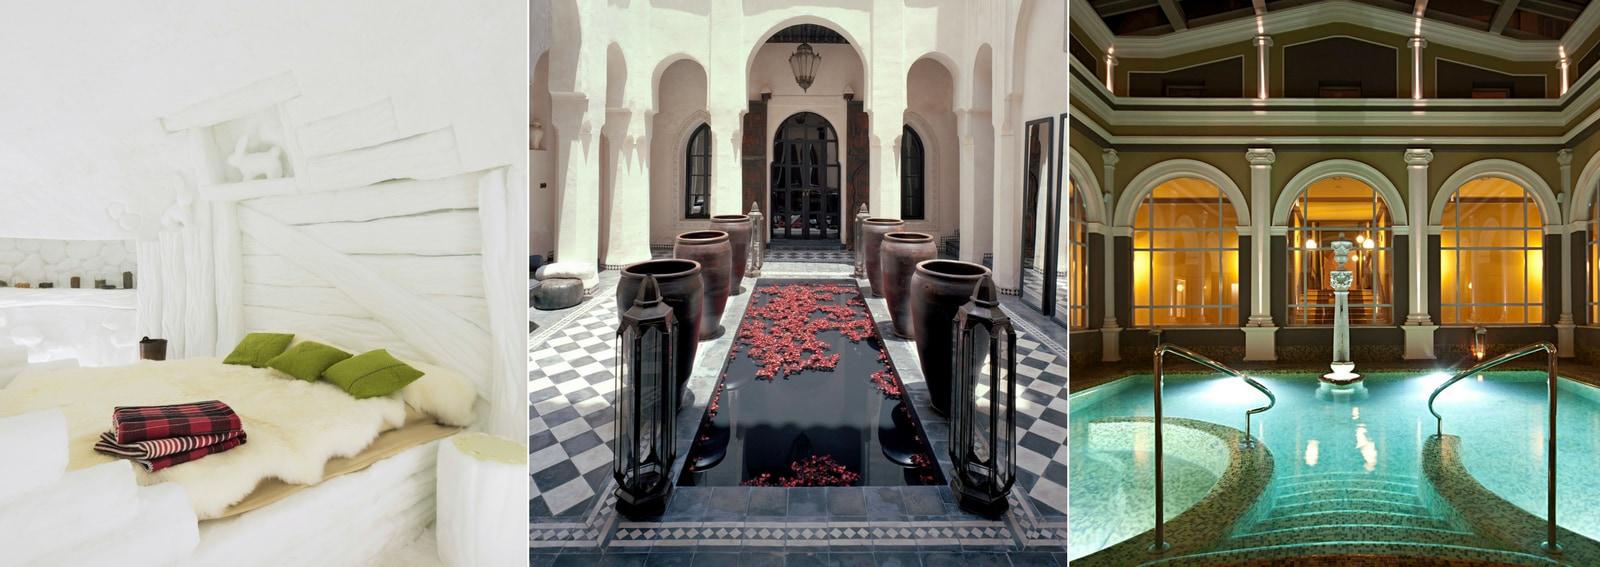 Qatar Marocco Montagna Agriturismo Verona in love San Valentino festa innamorati weekend romantici DESK